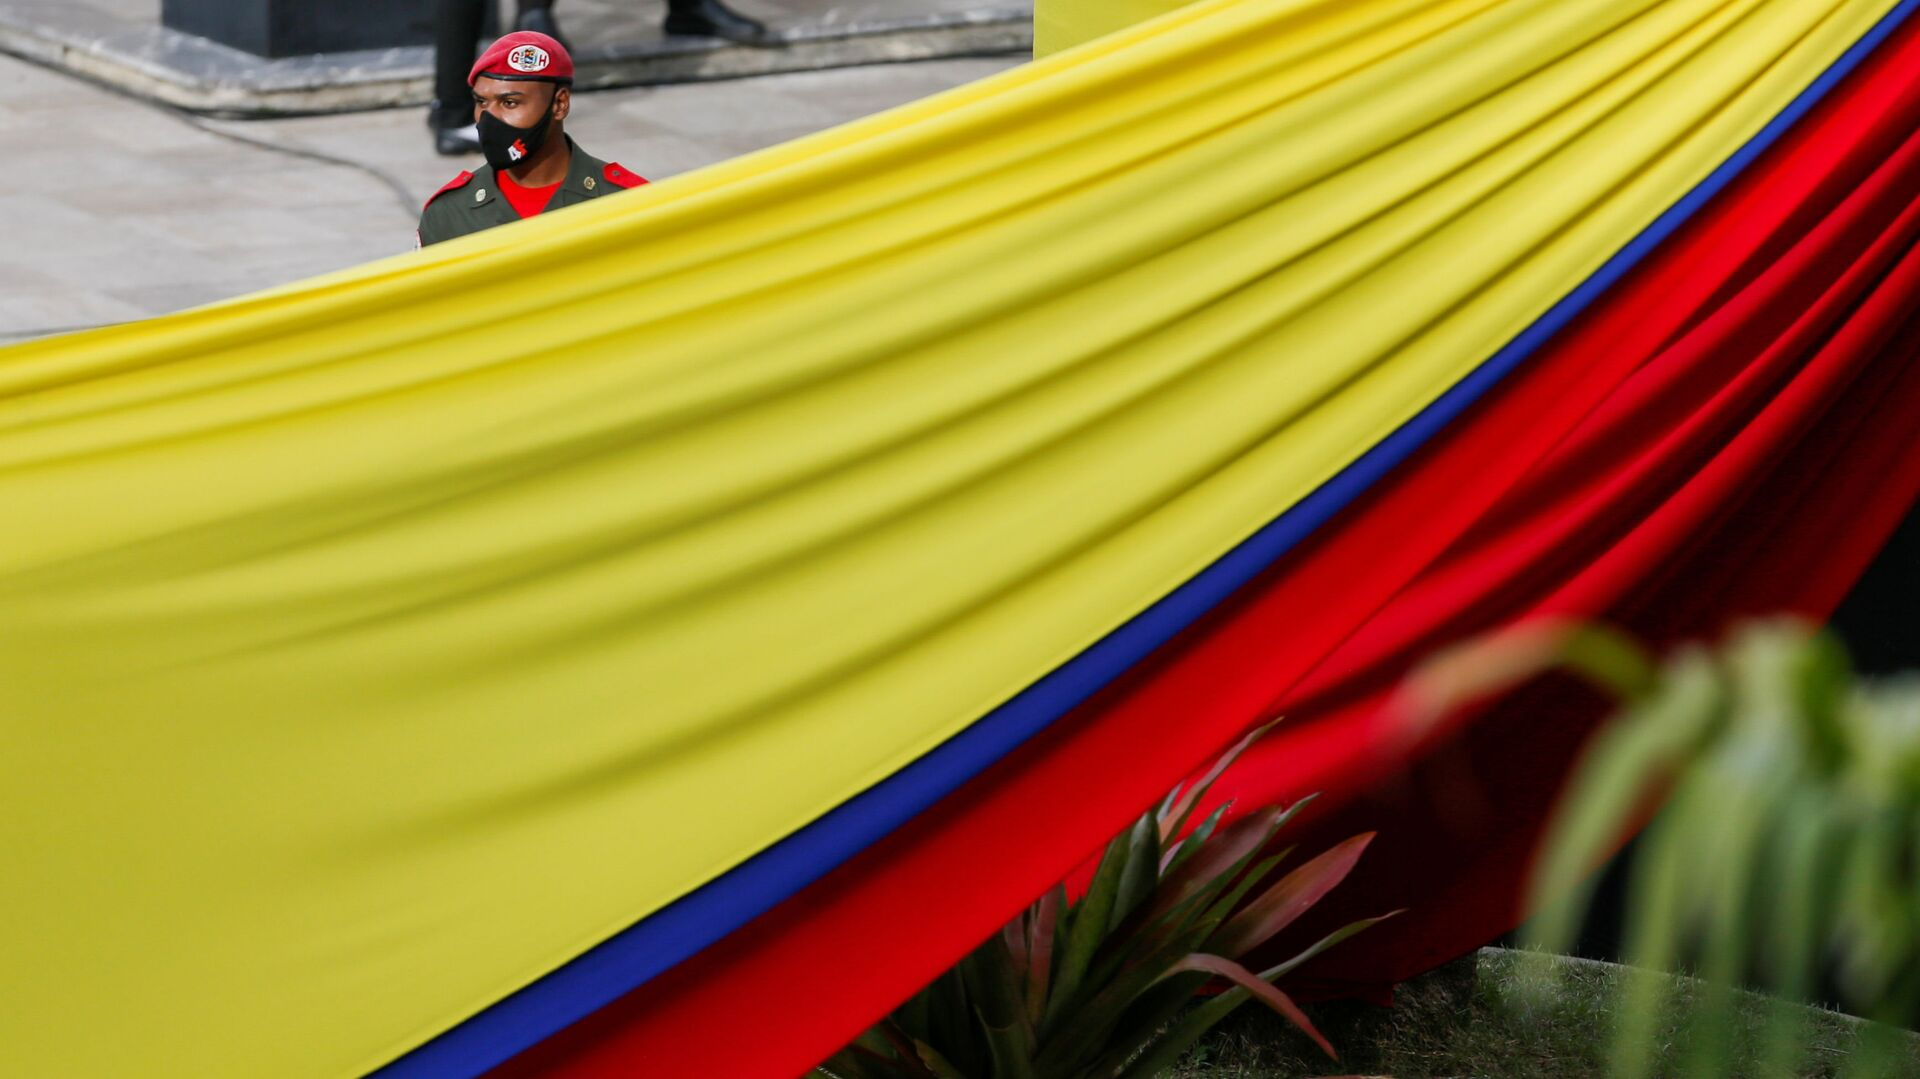 Bandera de Venezuela - Sputnik Mundo, 1920, 18.06.2021